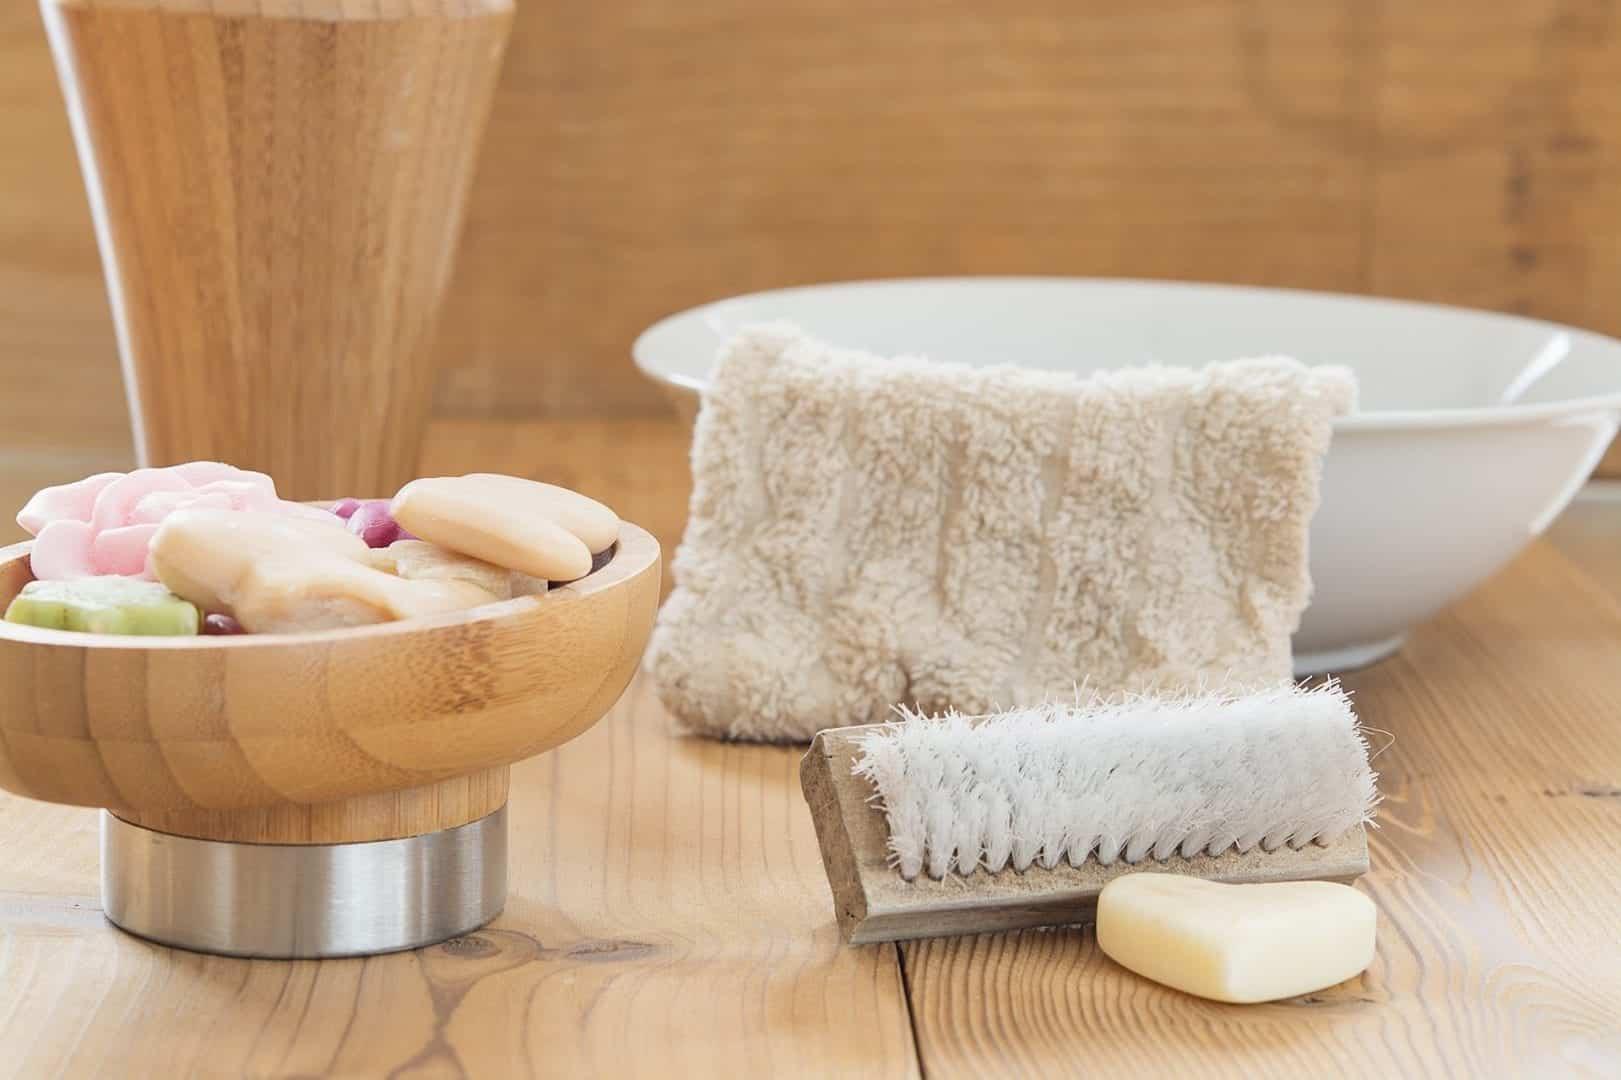 Sabonete de enxofre- Pra que serve, benefícios + receita caseira